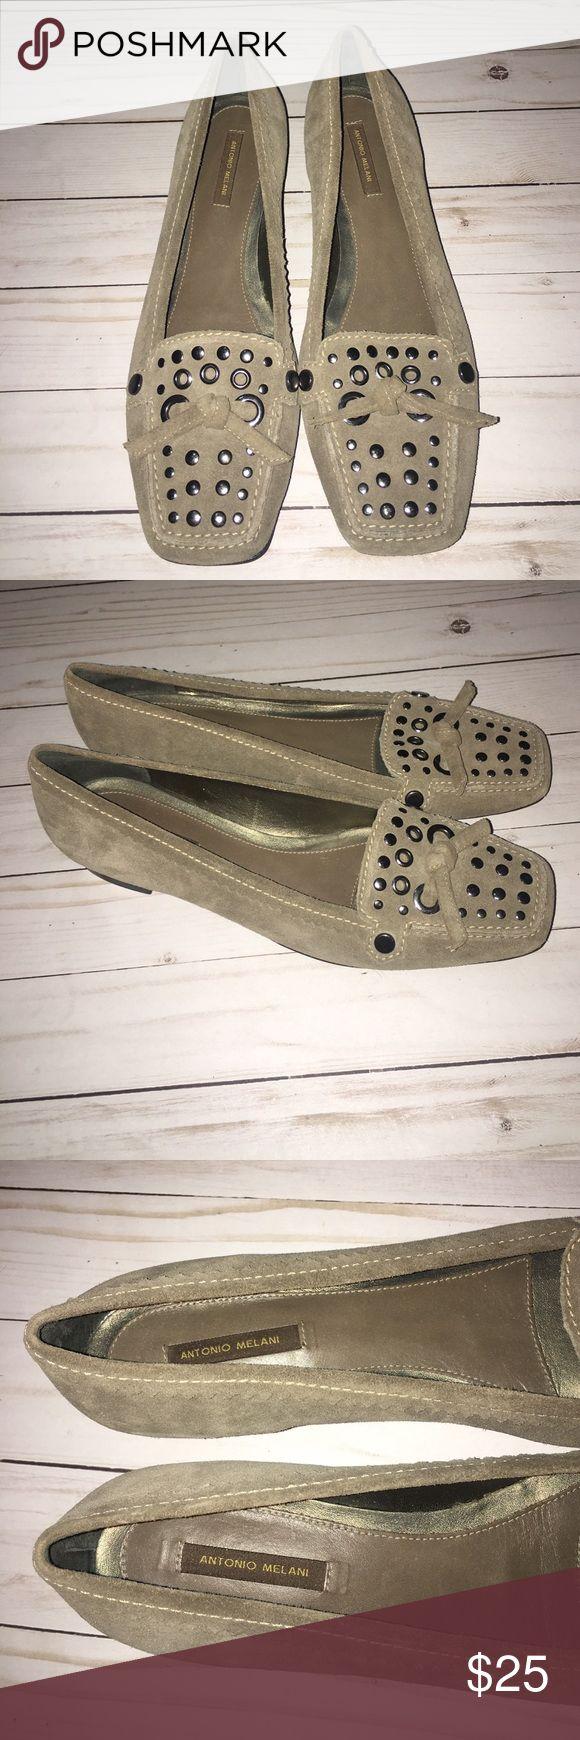 Antonio Melani Katelyn Studded Loafers Flats-9M Antonio Melani flats- Studded brown size 9M ANTONIO MELANI Shoes Flats & Loafers